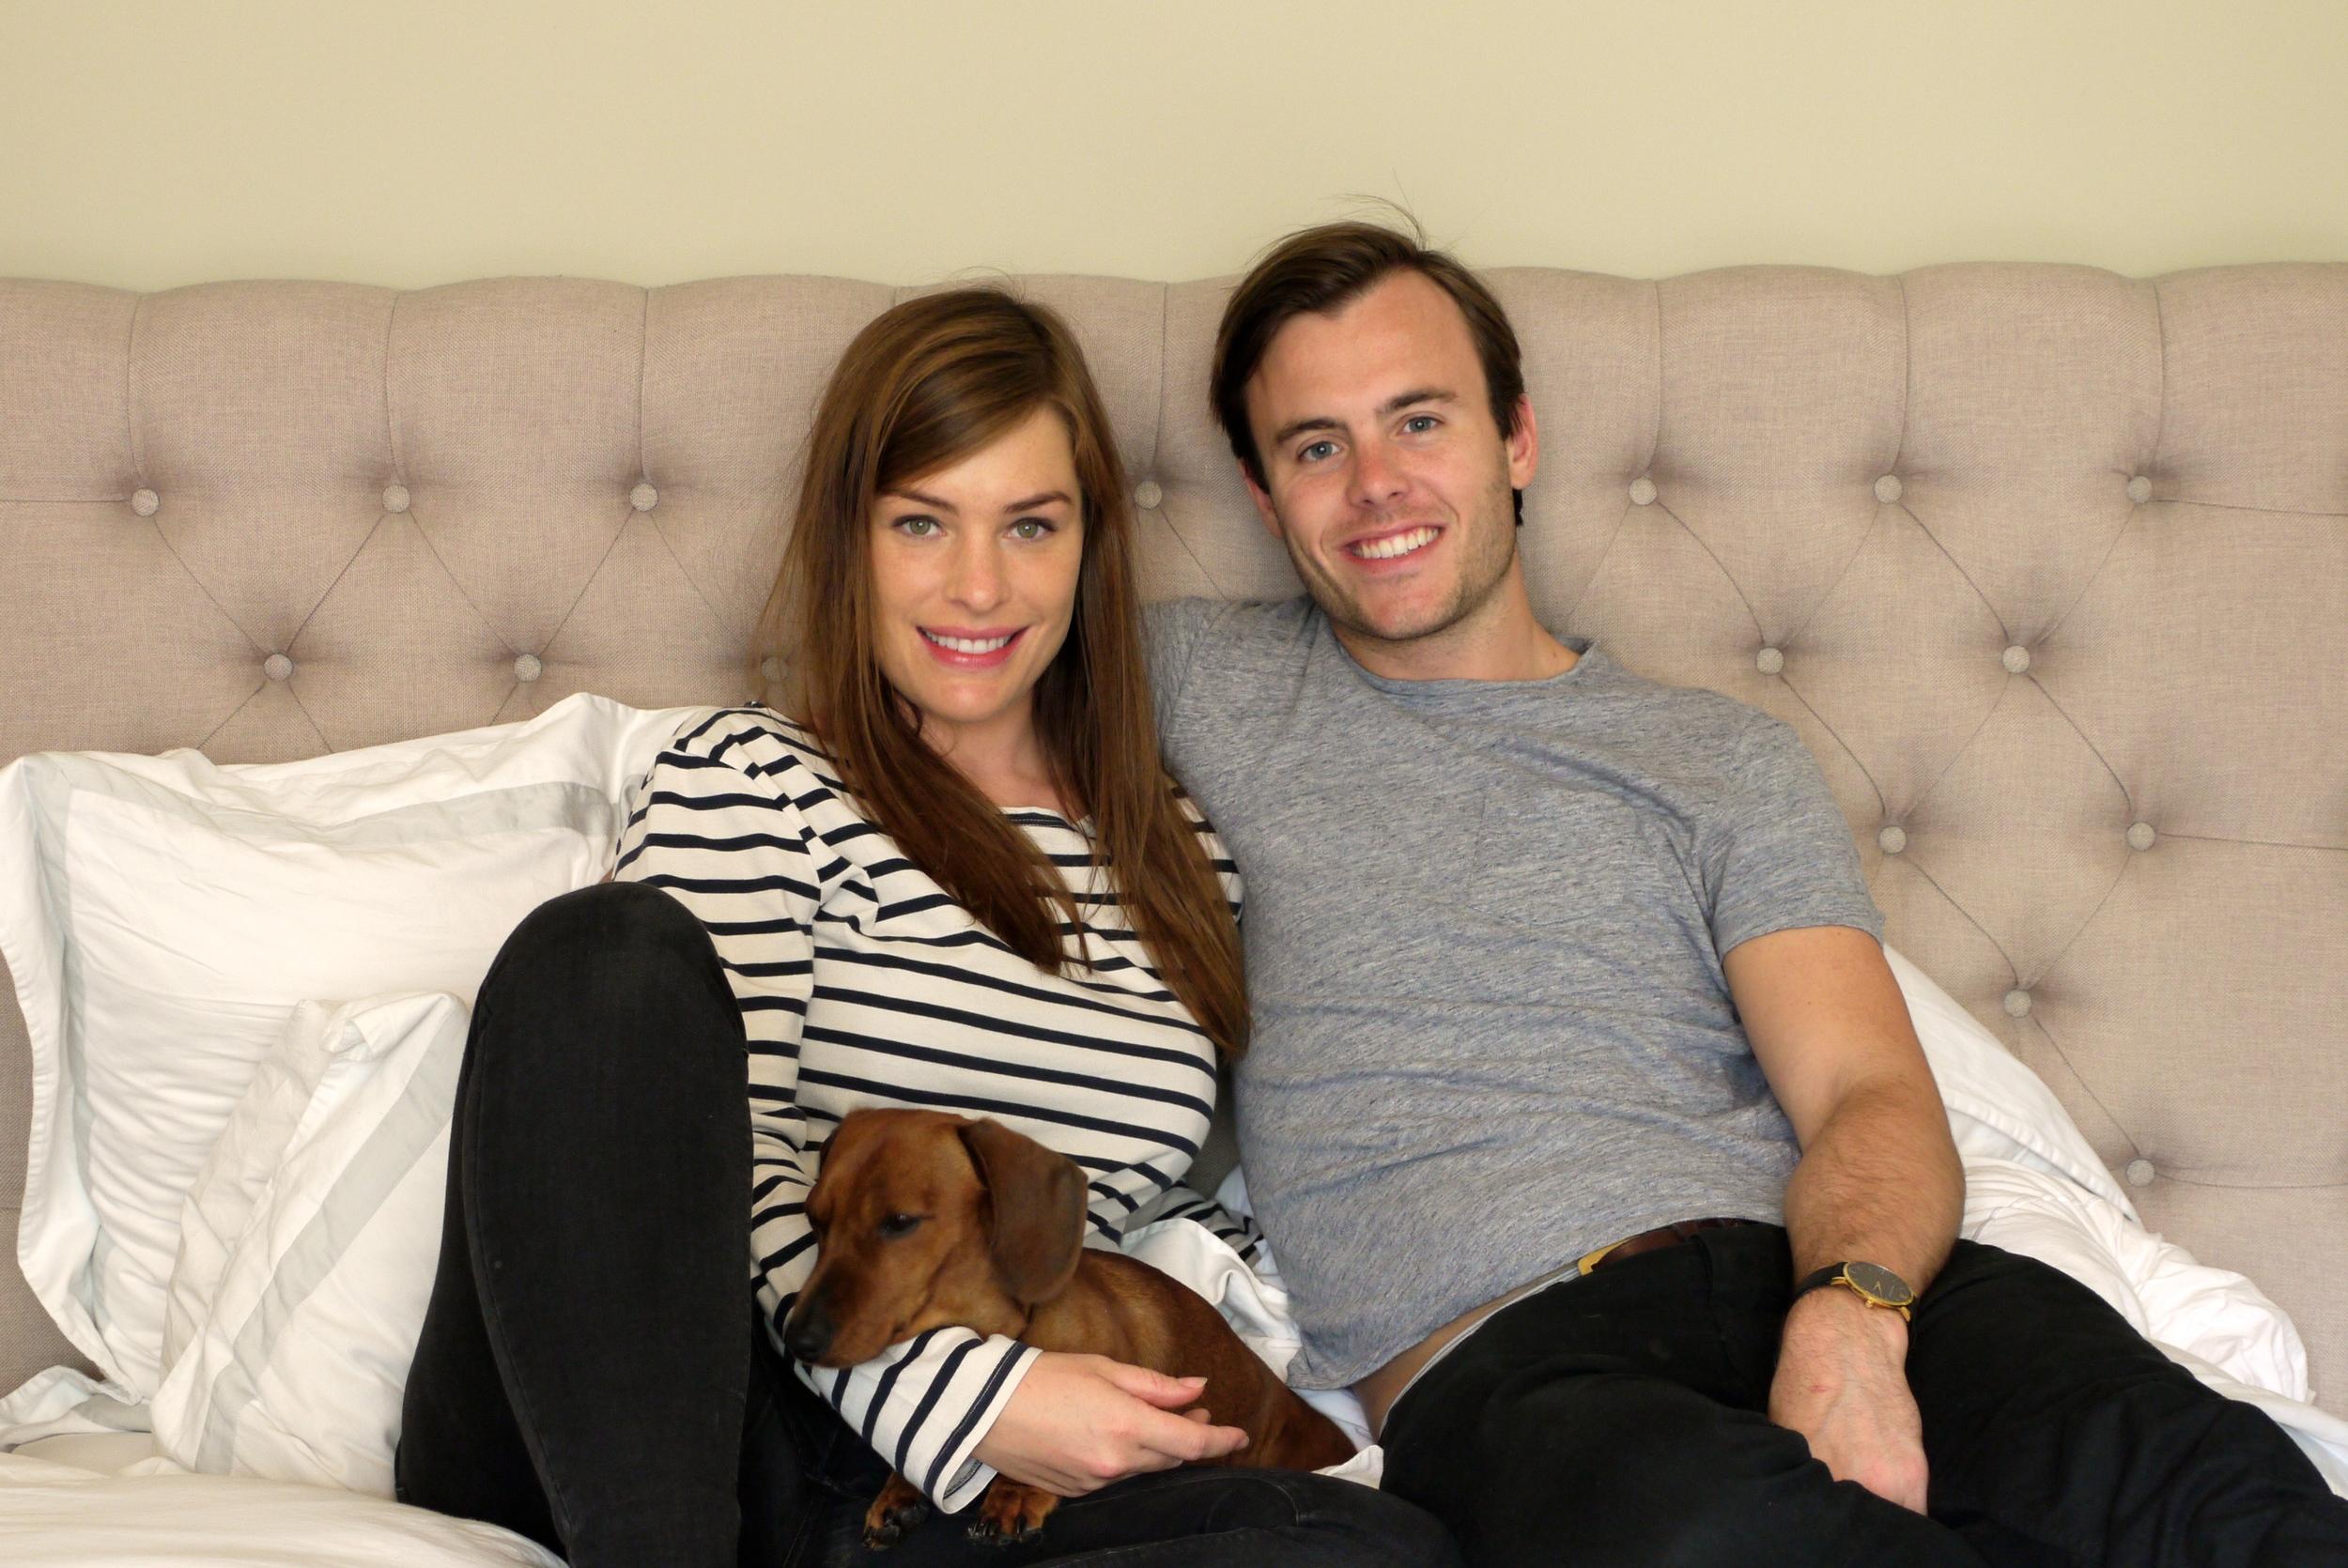 Sarah and Jack Spencer-Ashworth